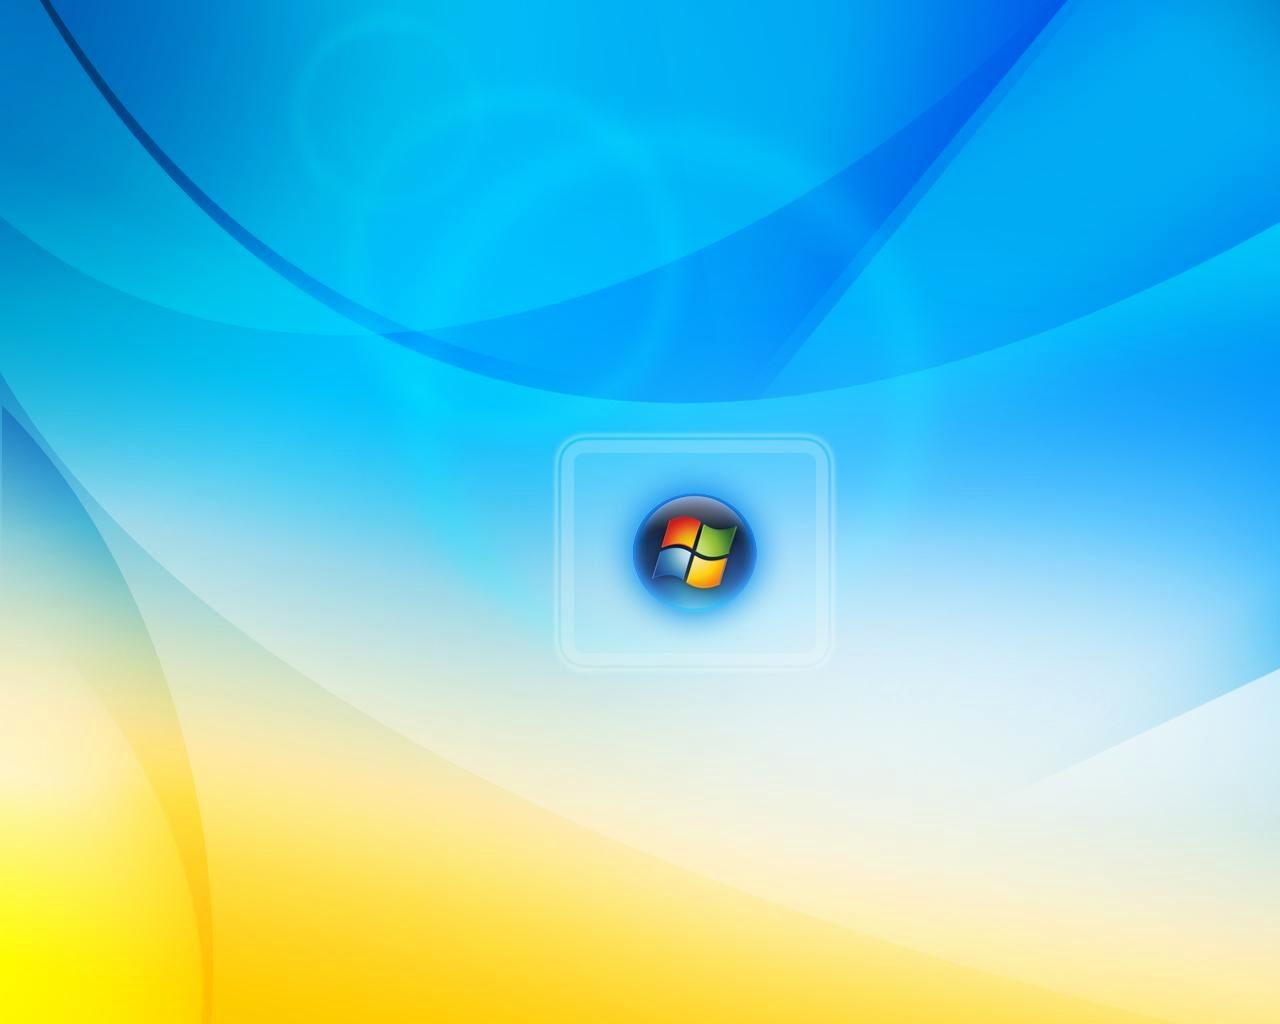 Get Windows Yellow Wallpaper Apple Logo Hd Wallpapers 1080p